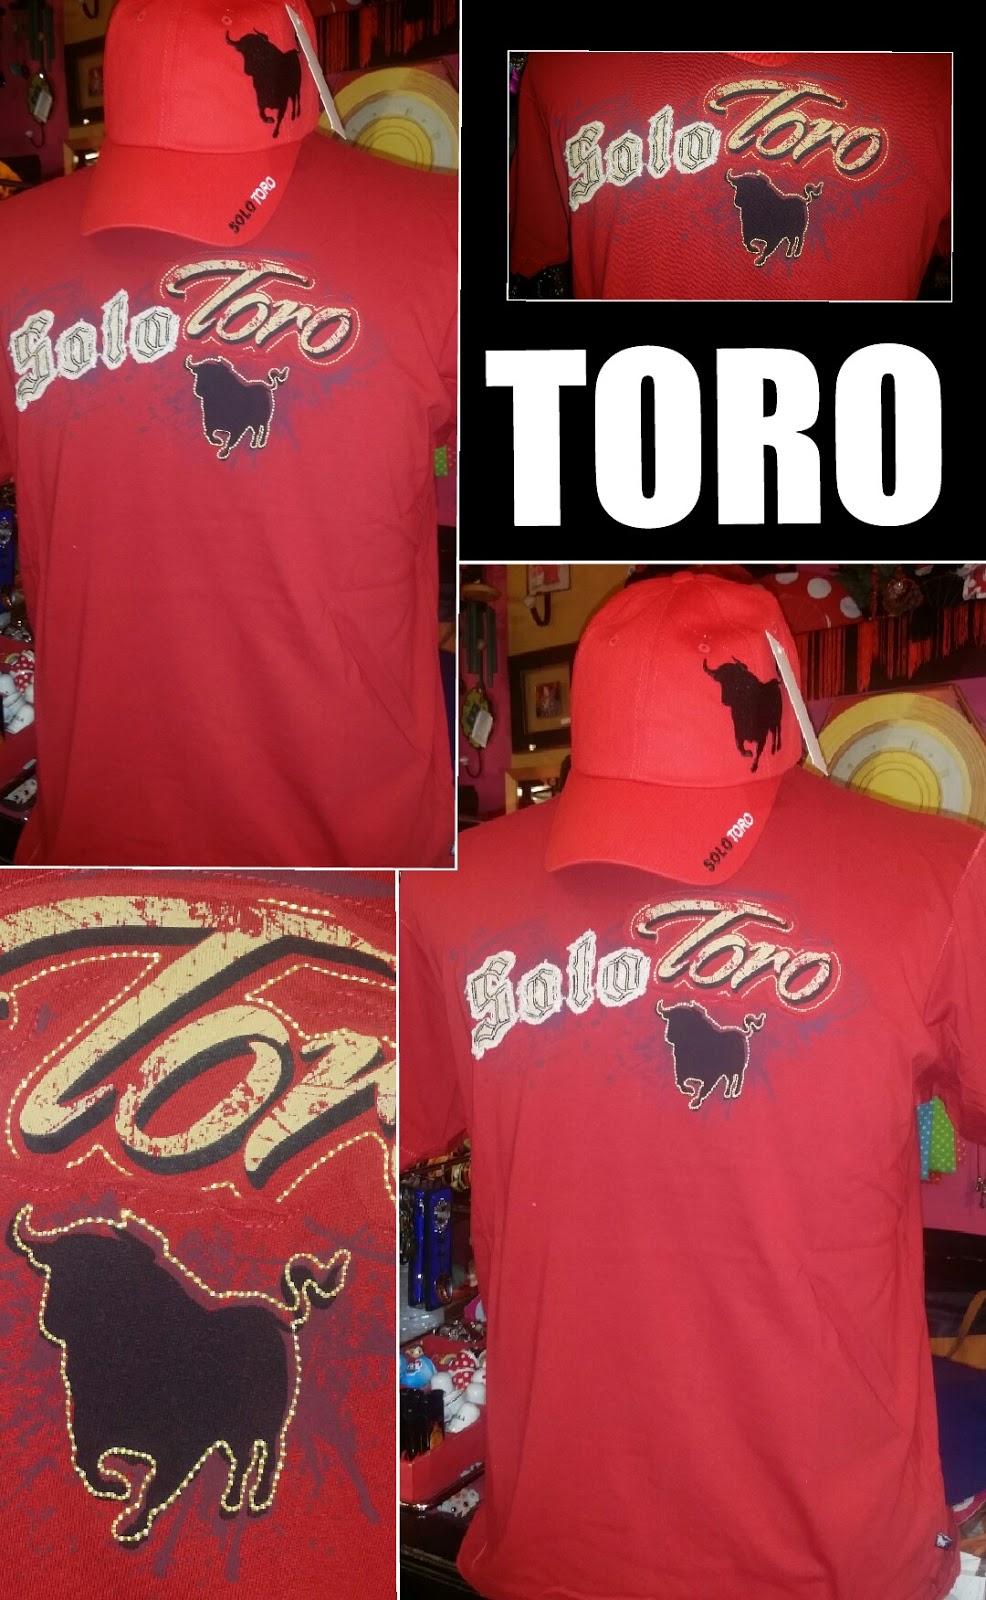 594f1e6ae CAMISETAS SOLO TORO